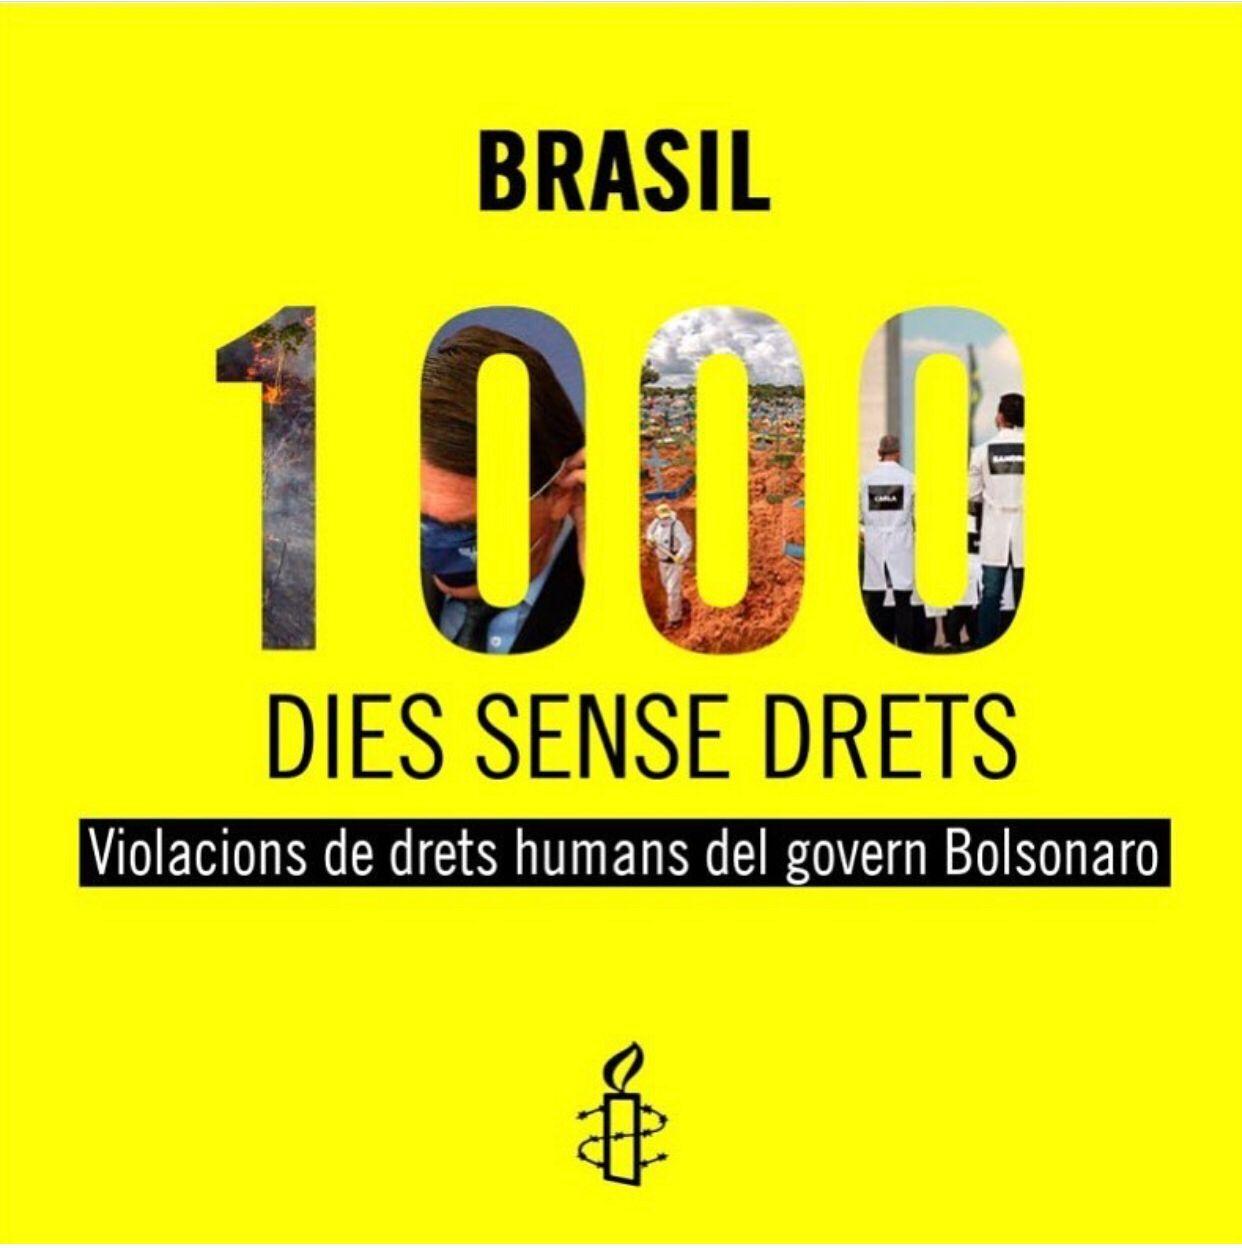 1.000 dies de Bolsonaro al Brasil: 1.000 dies sense drets